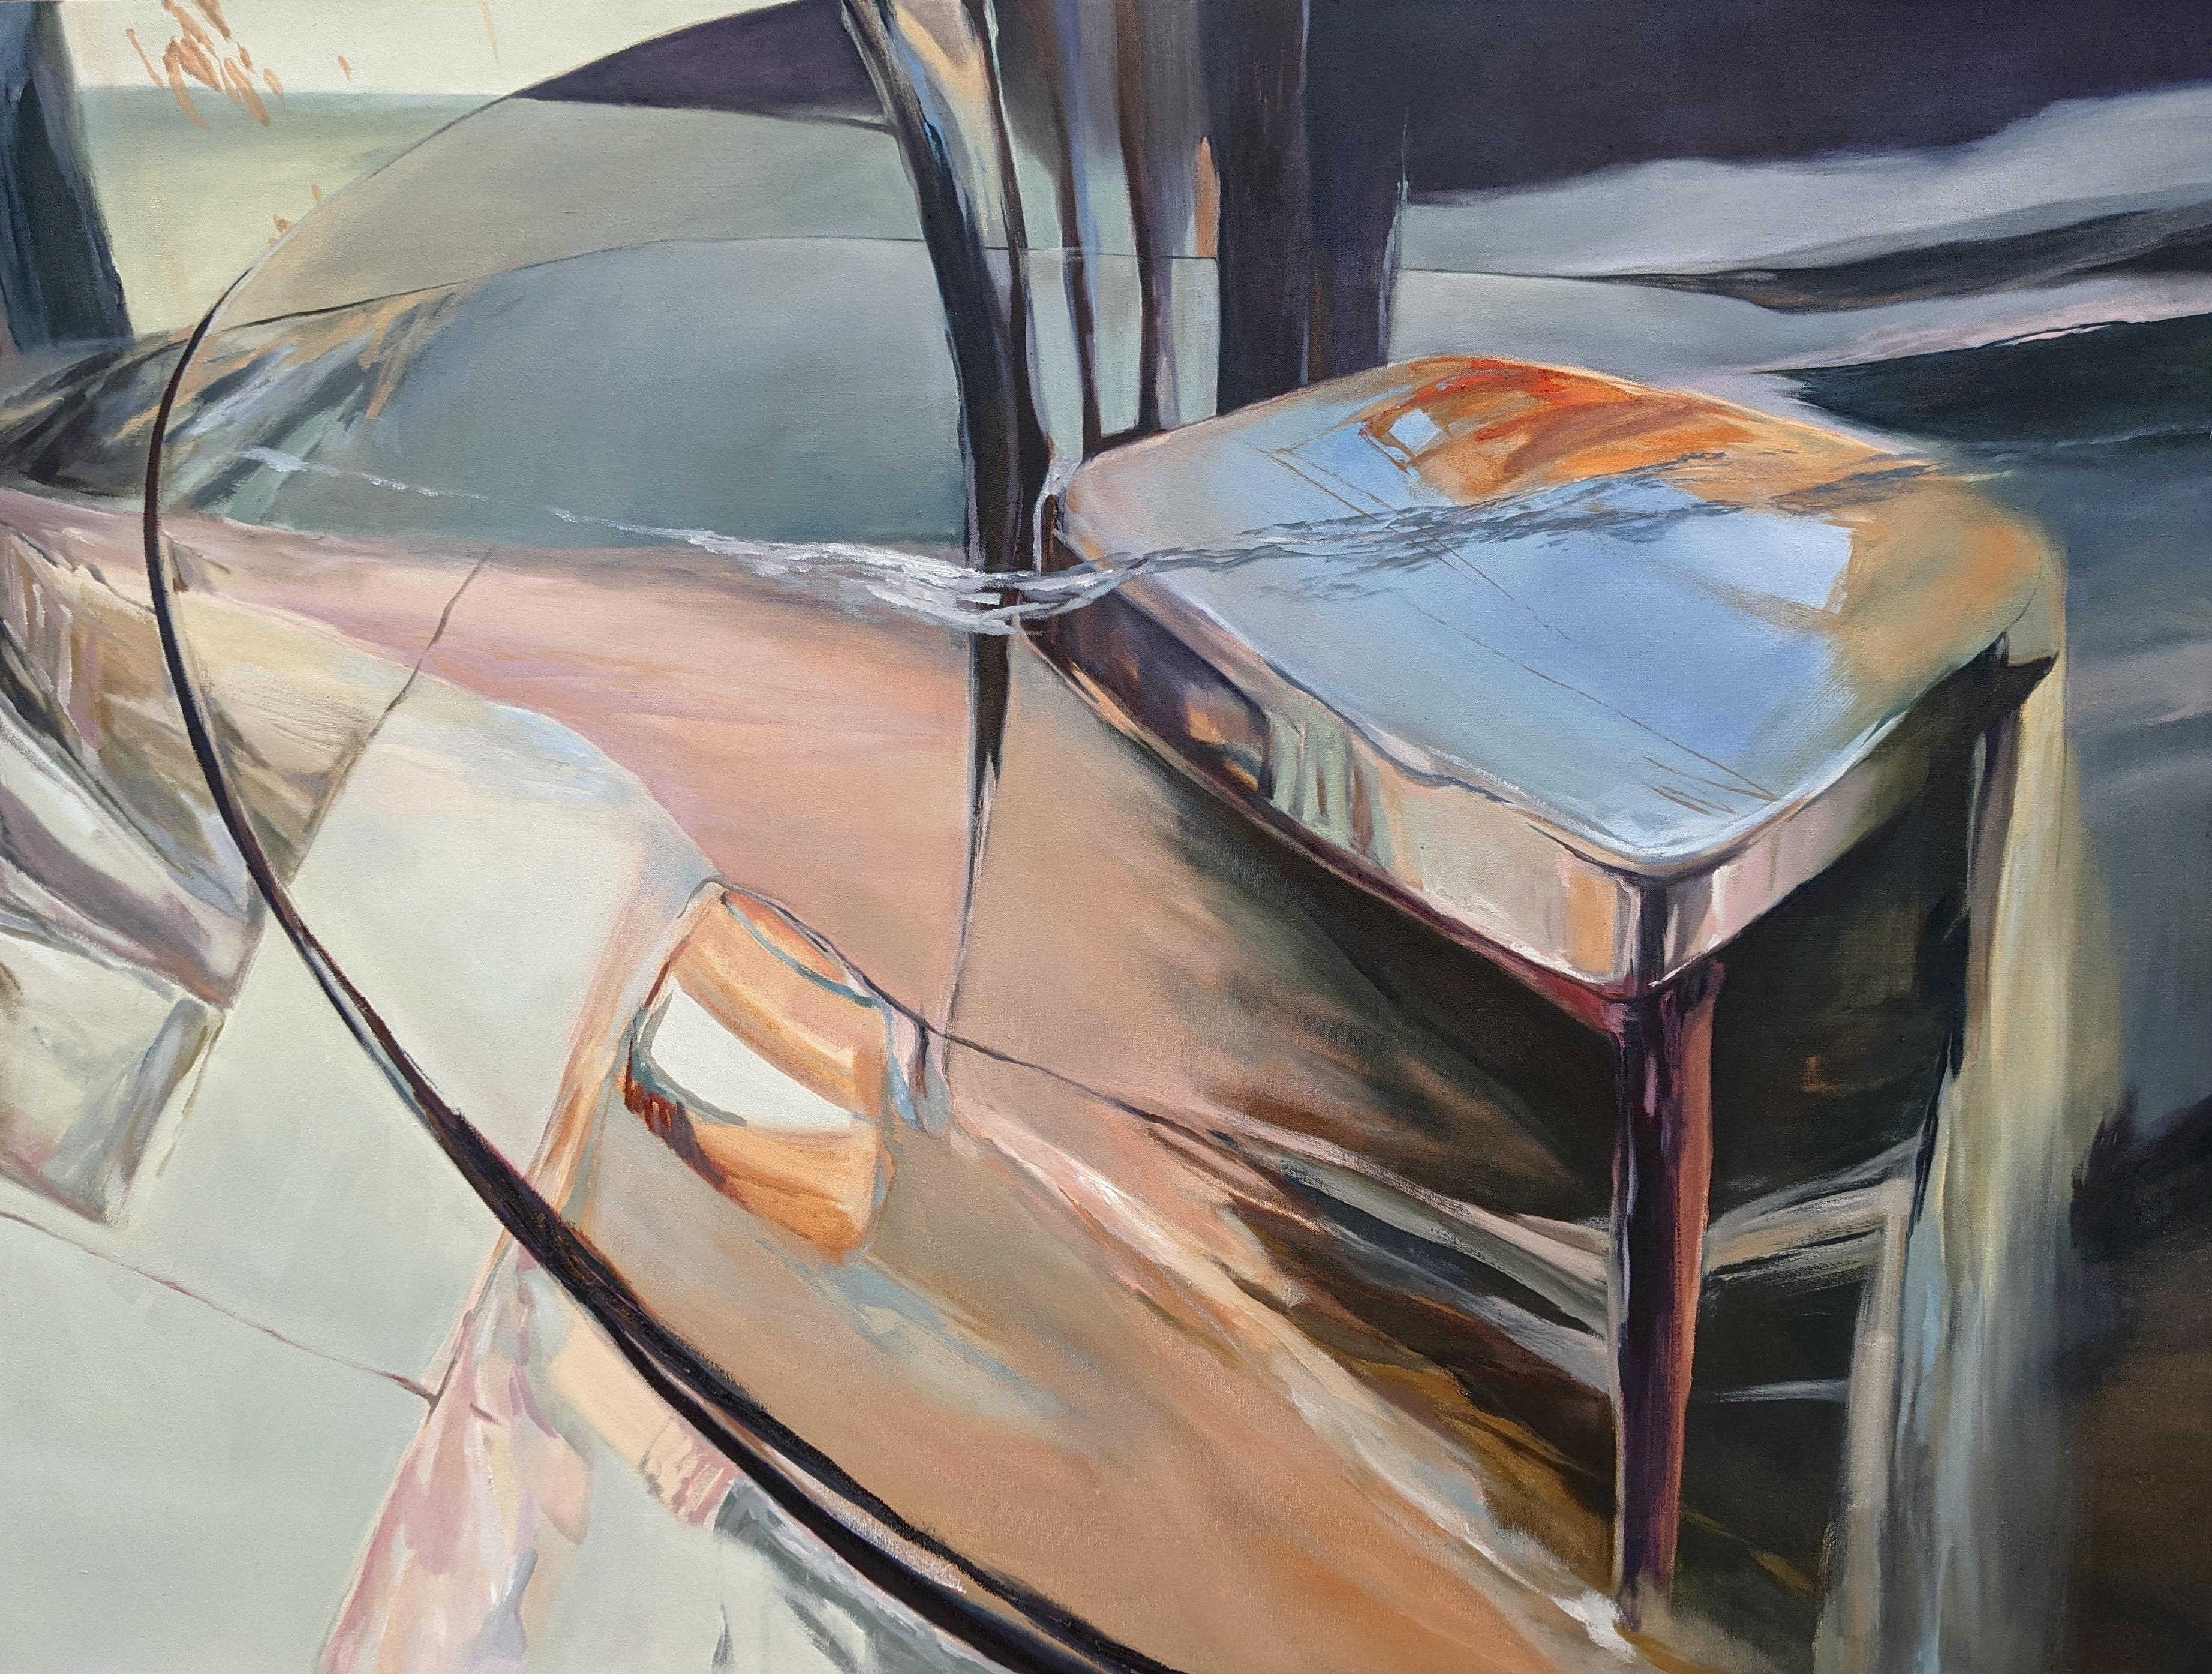 Chenxi Gao, Wind, Oil on Canvas, April 2021, 45 x 60